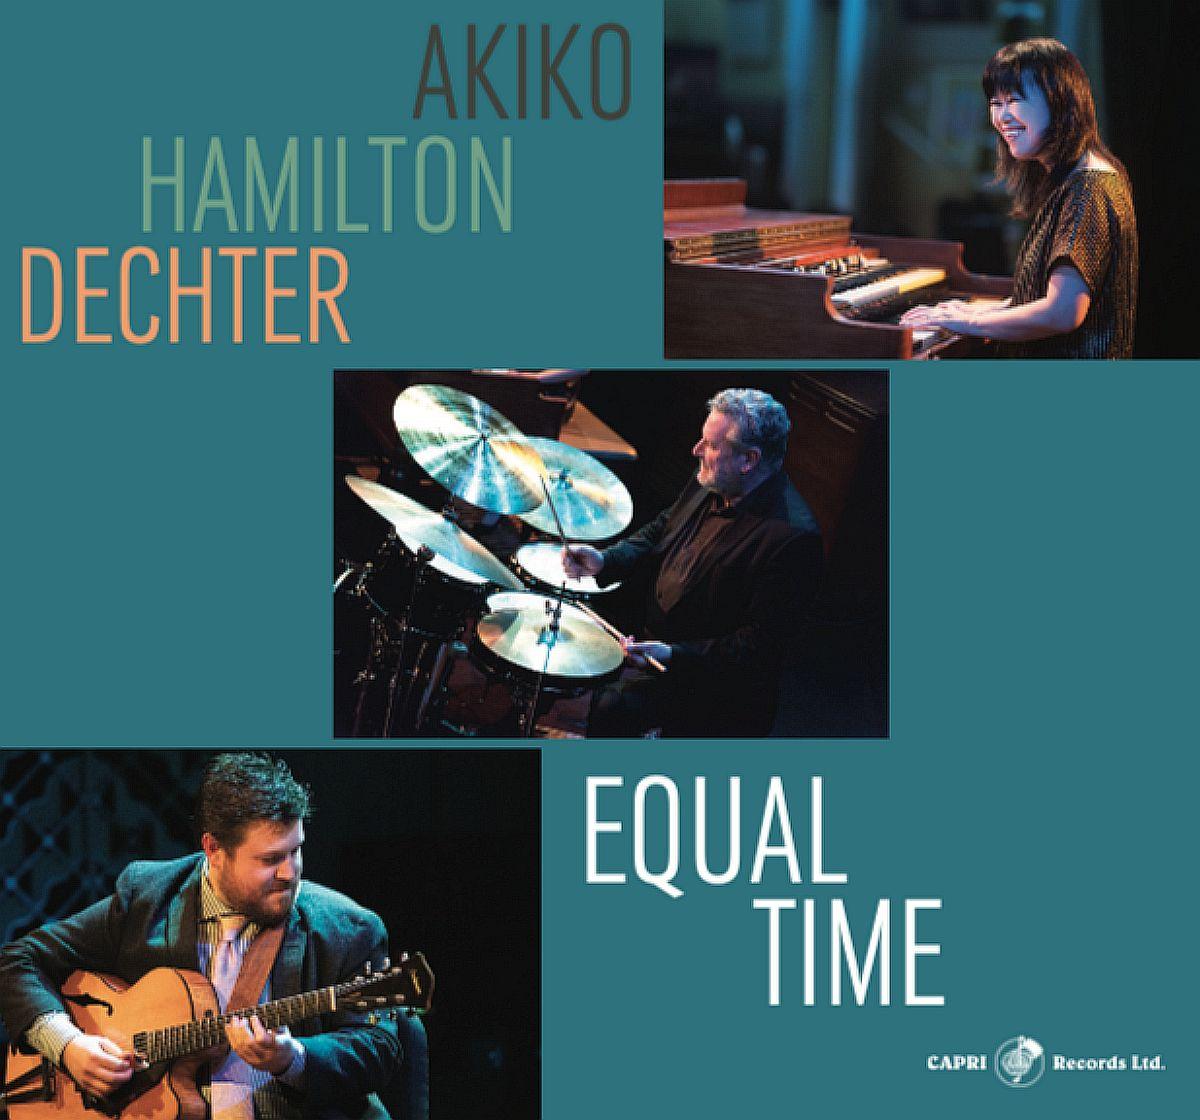 Akiko_Equal_Time_Cover